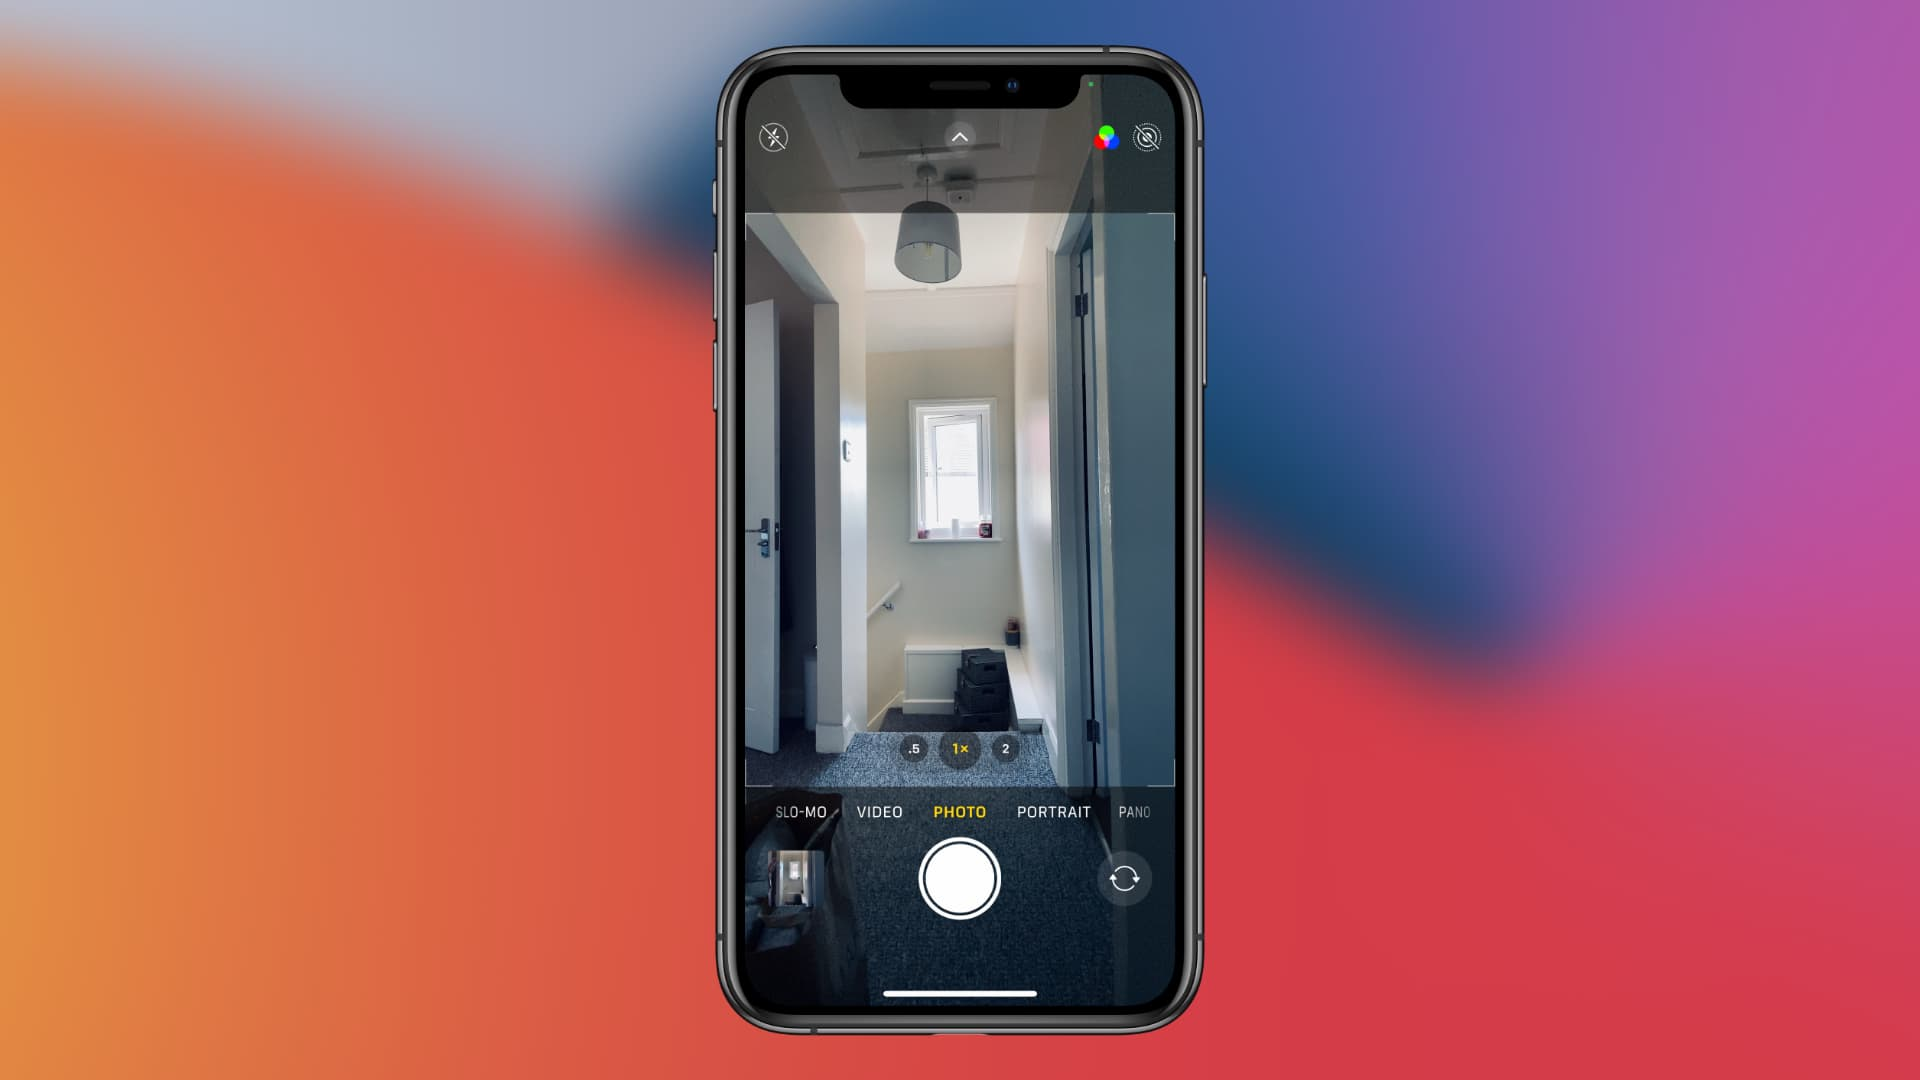 Camera app in iOS 14